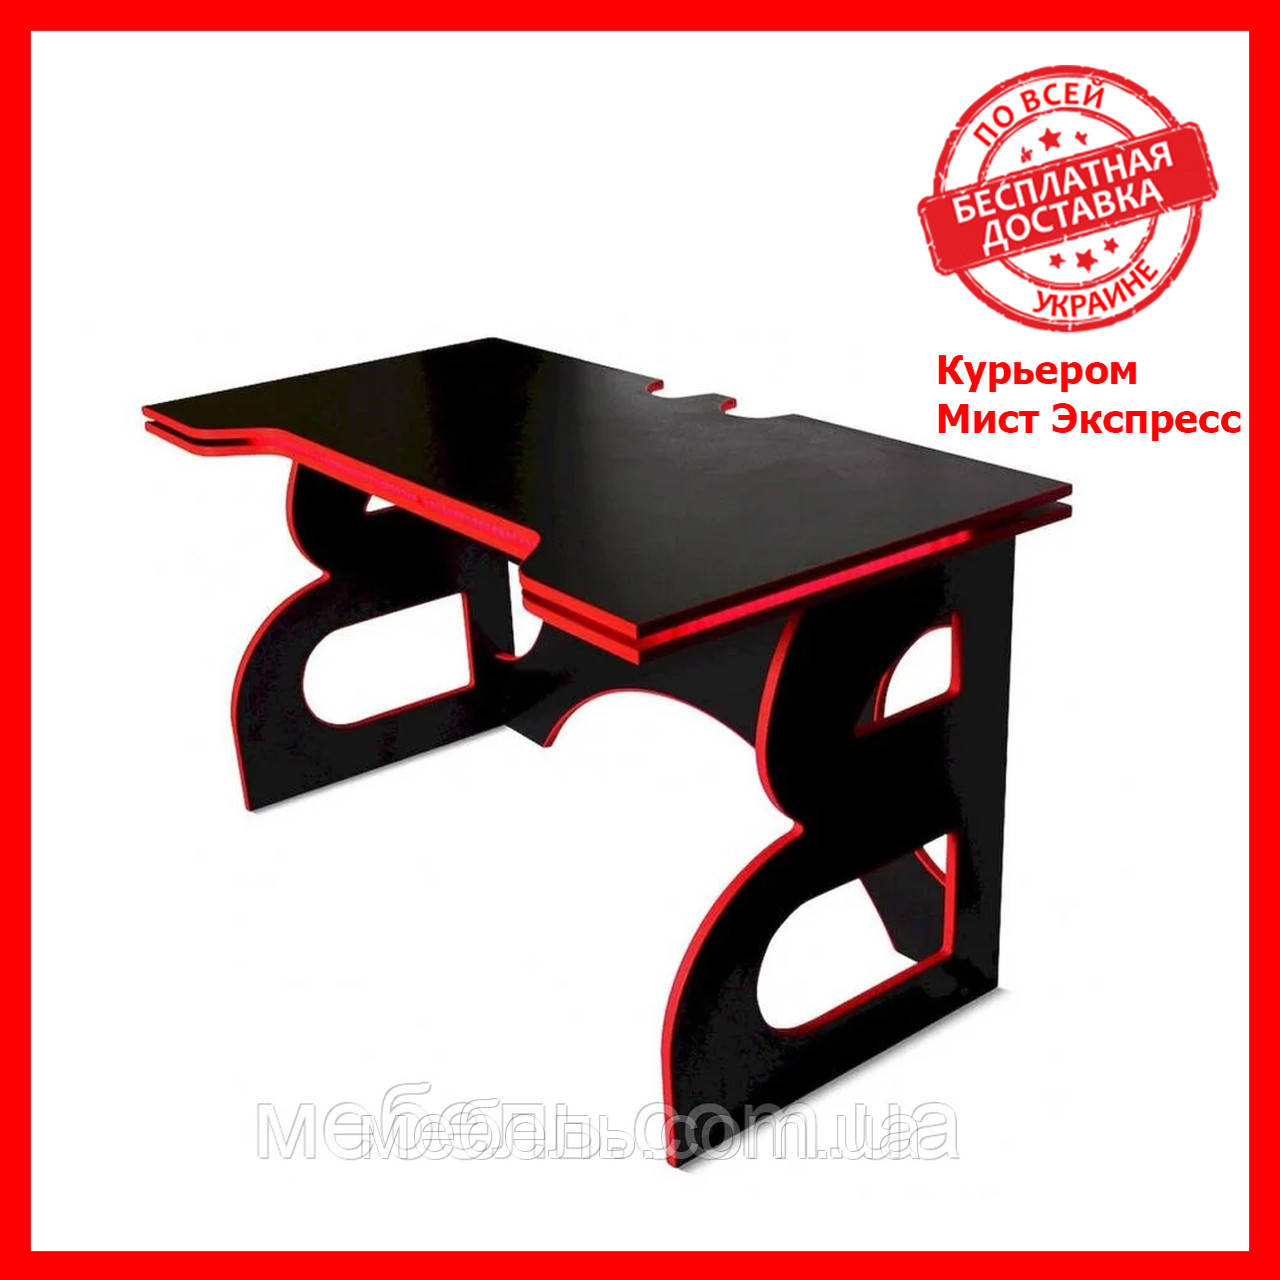 Компьютерный стол с тумбой Barsky Game Red HG-05/СUP-05/ПК-01